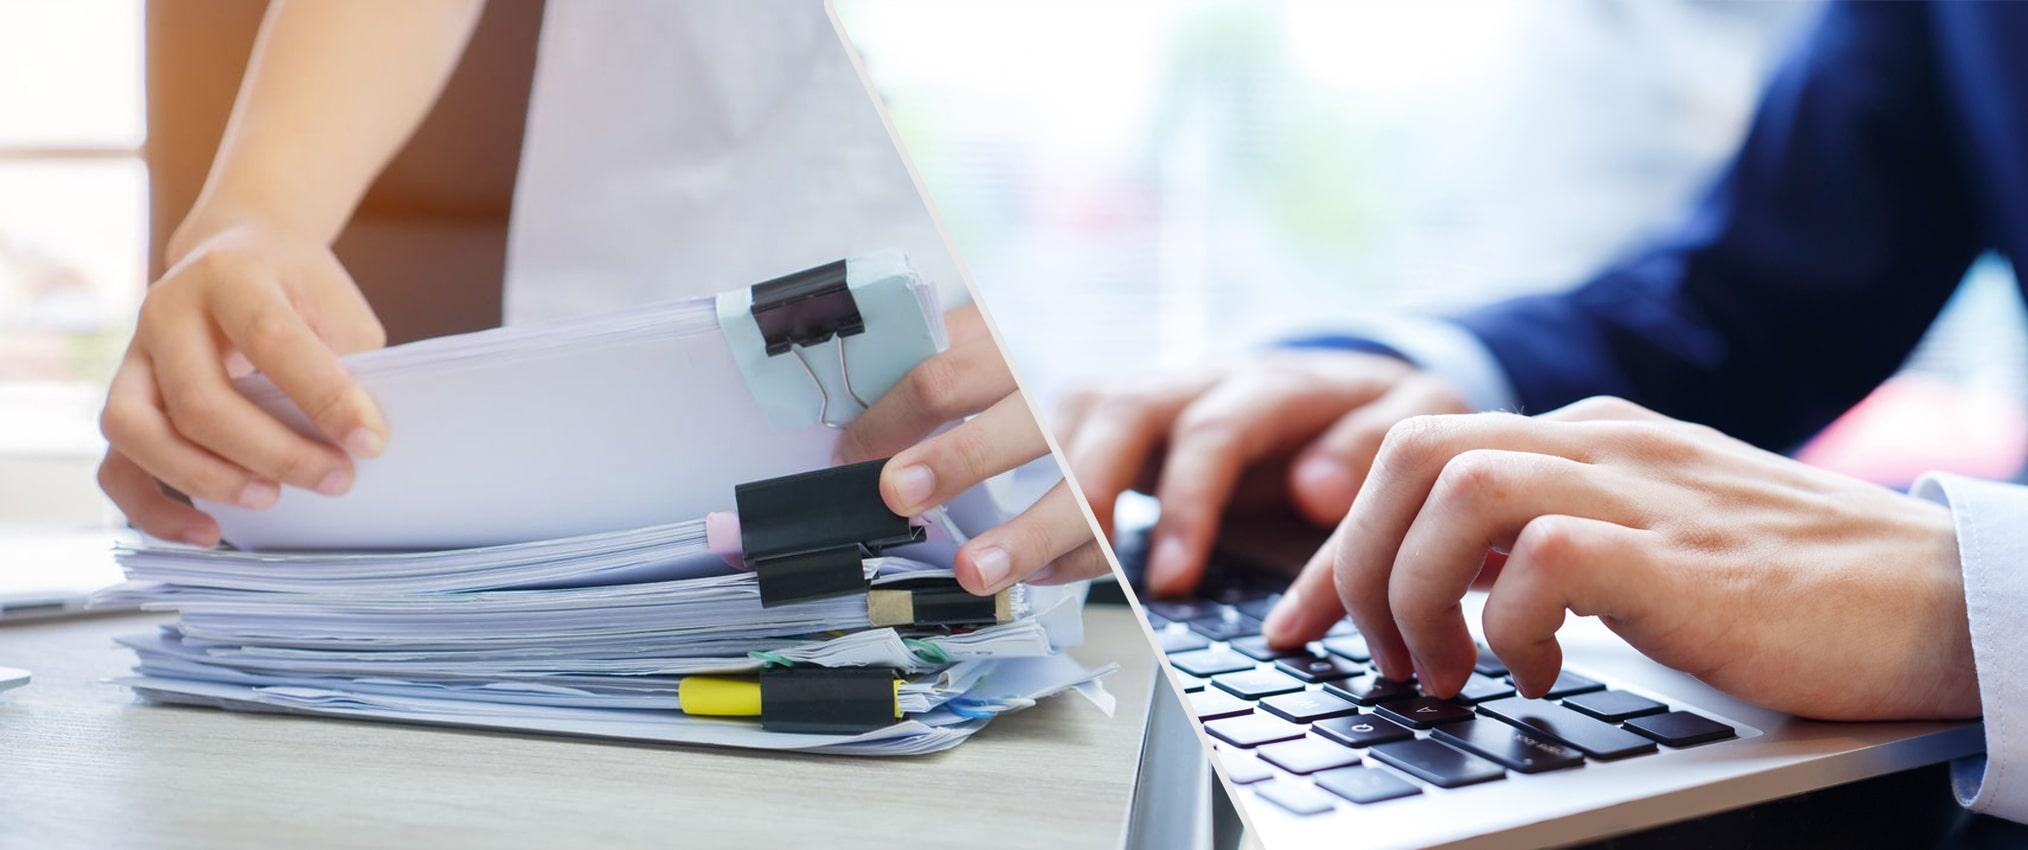 digitizing document record healthcare